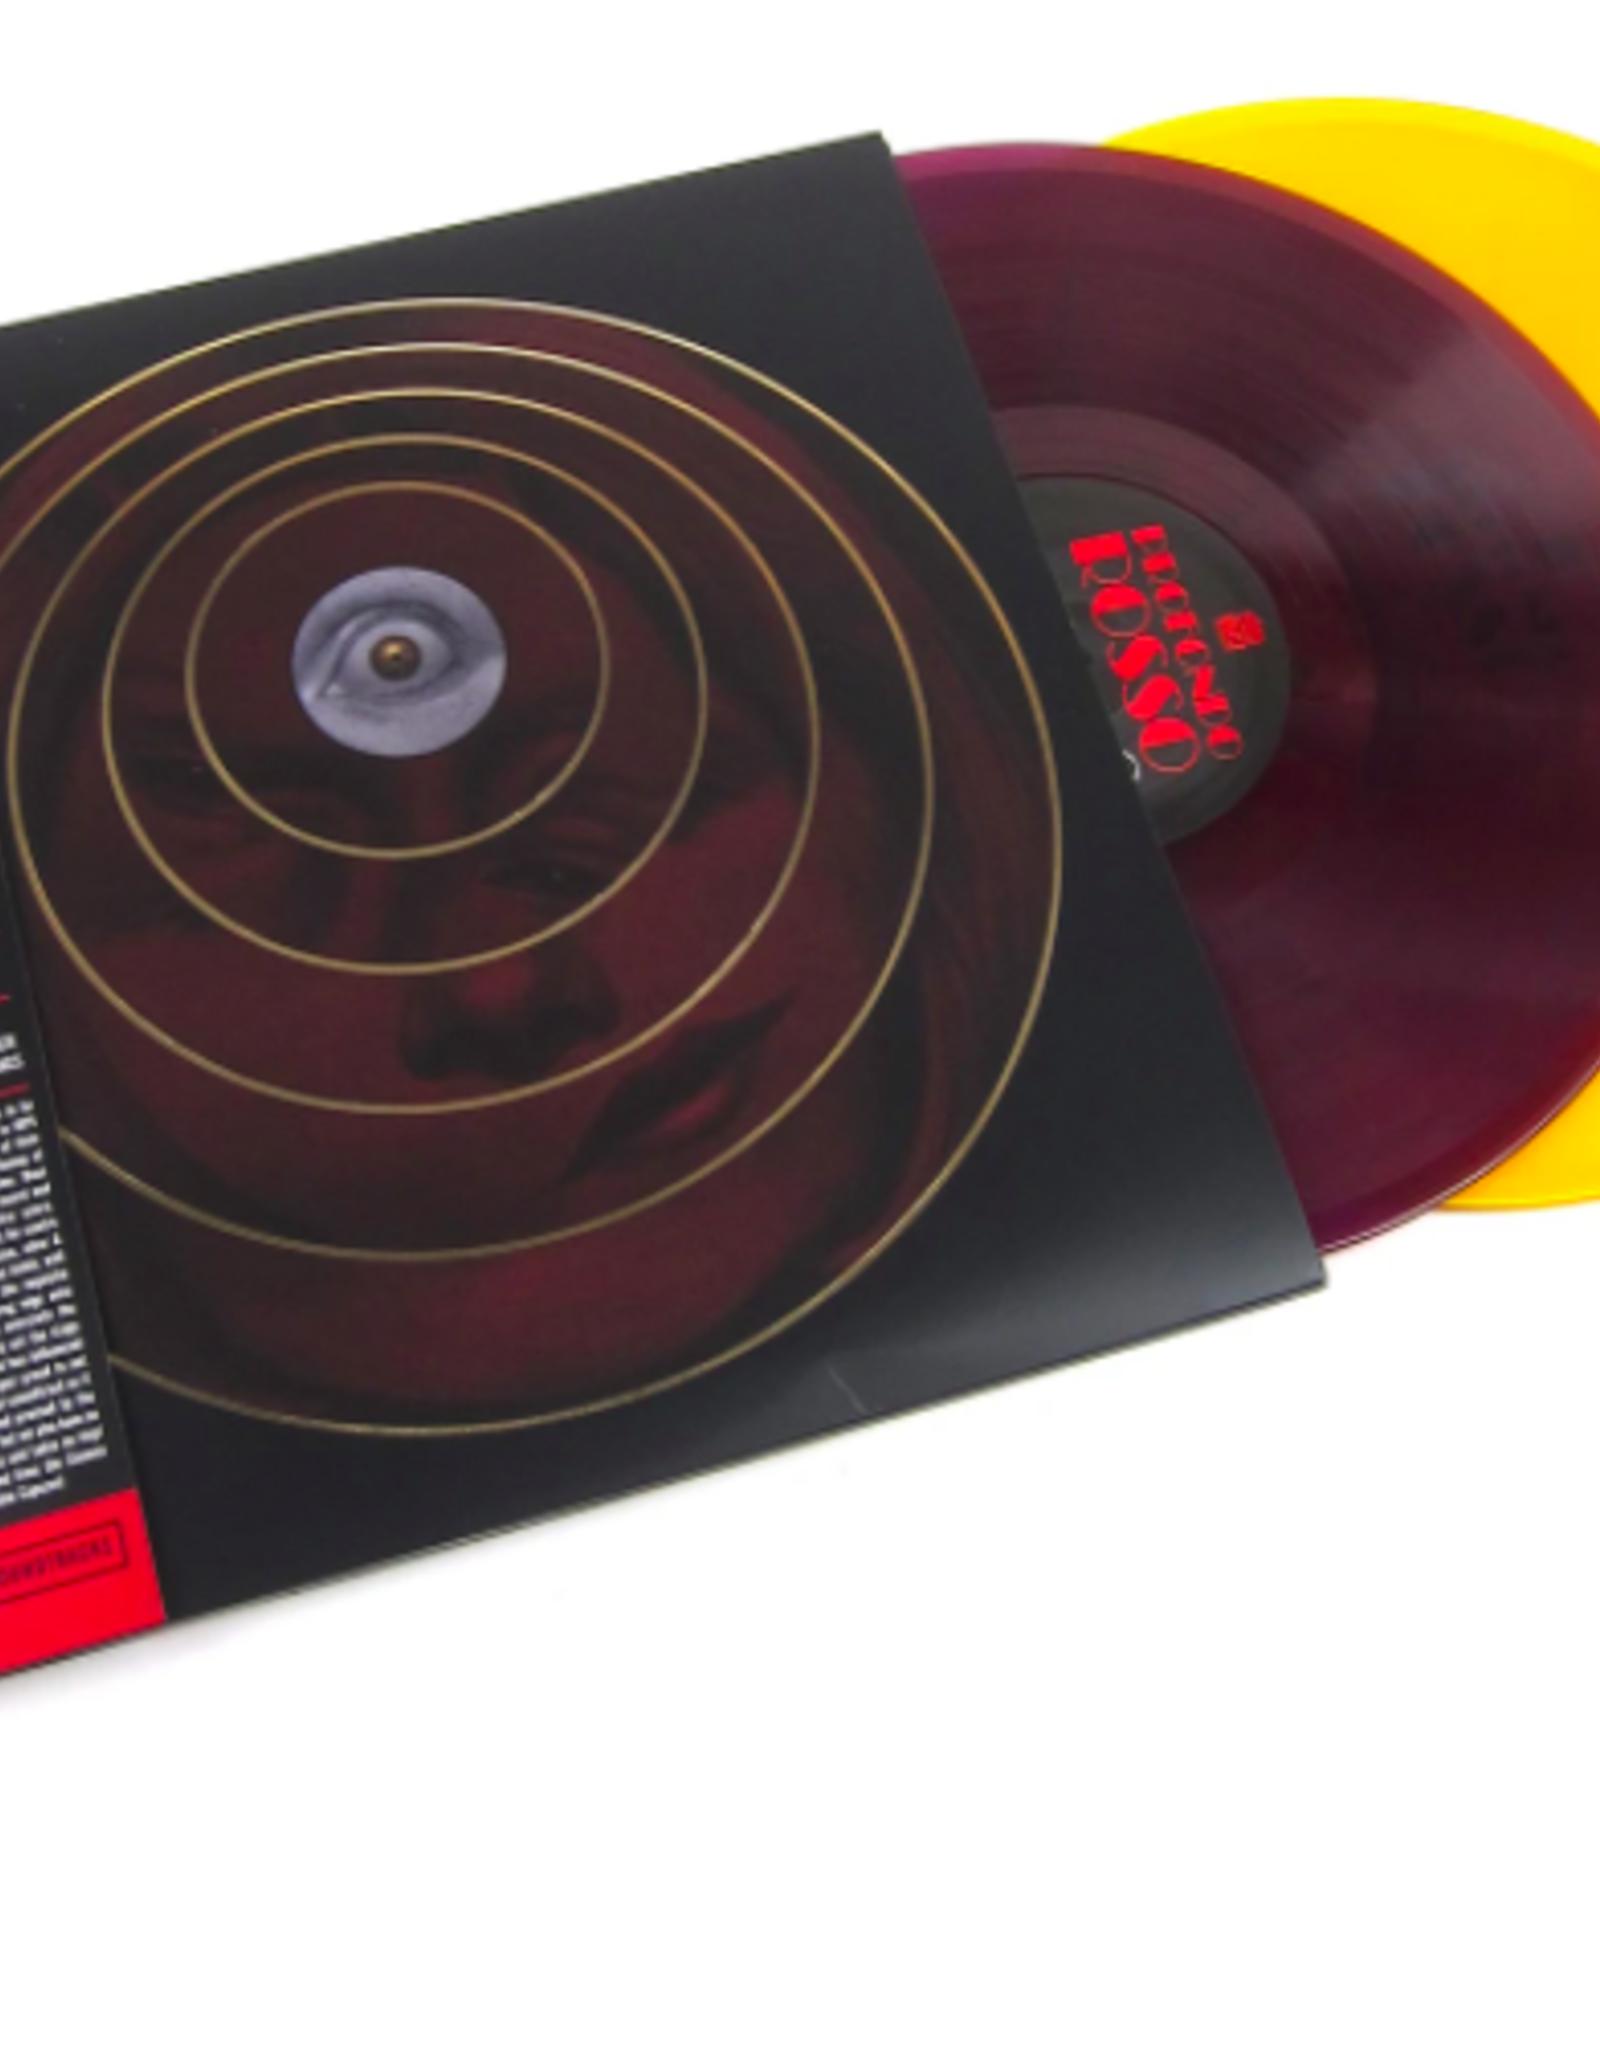 Goblin - Profondo Rosso (ORANGE 2xLP)